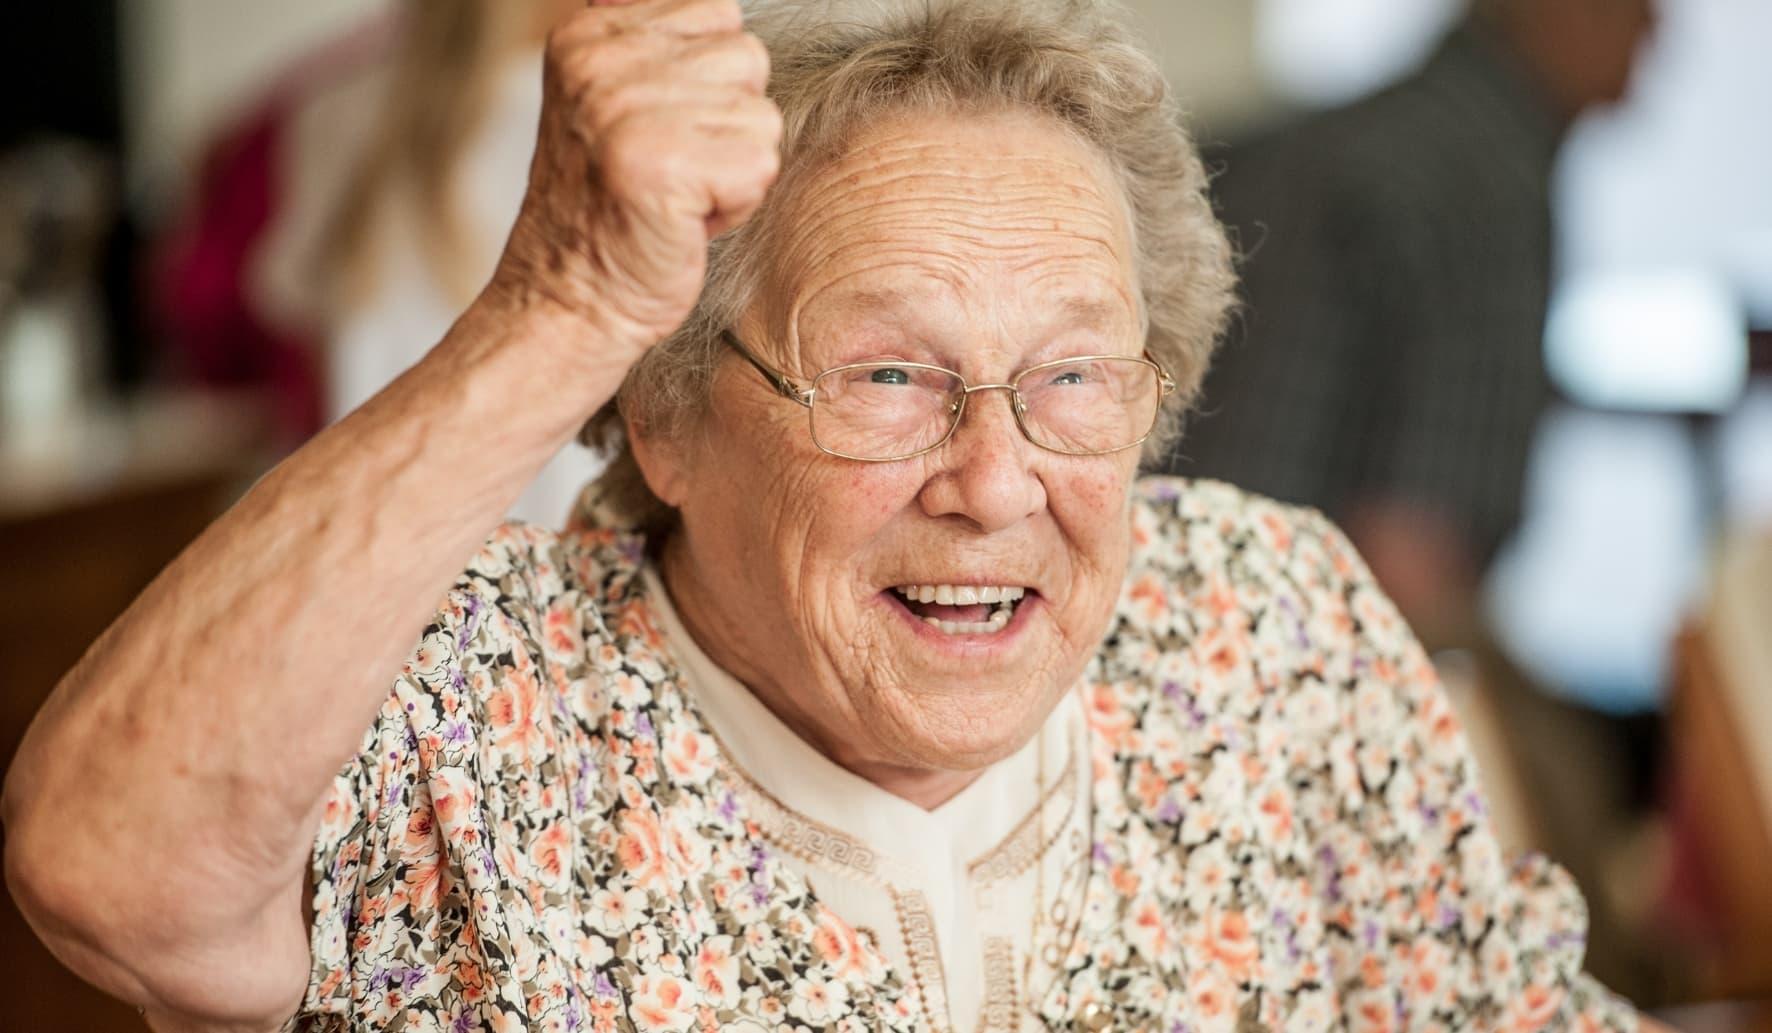 Dame âgée heureuse en maison de retraite.